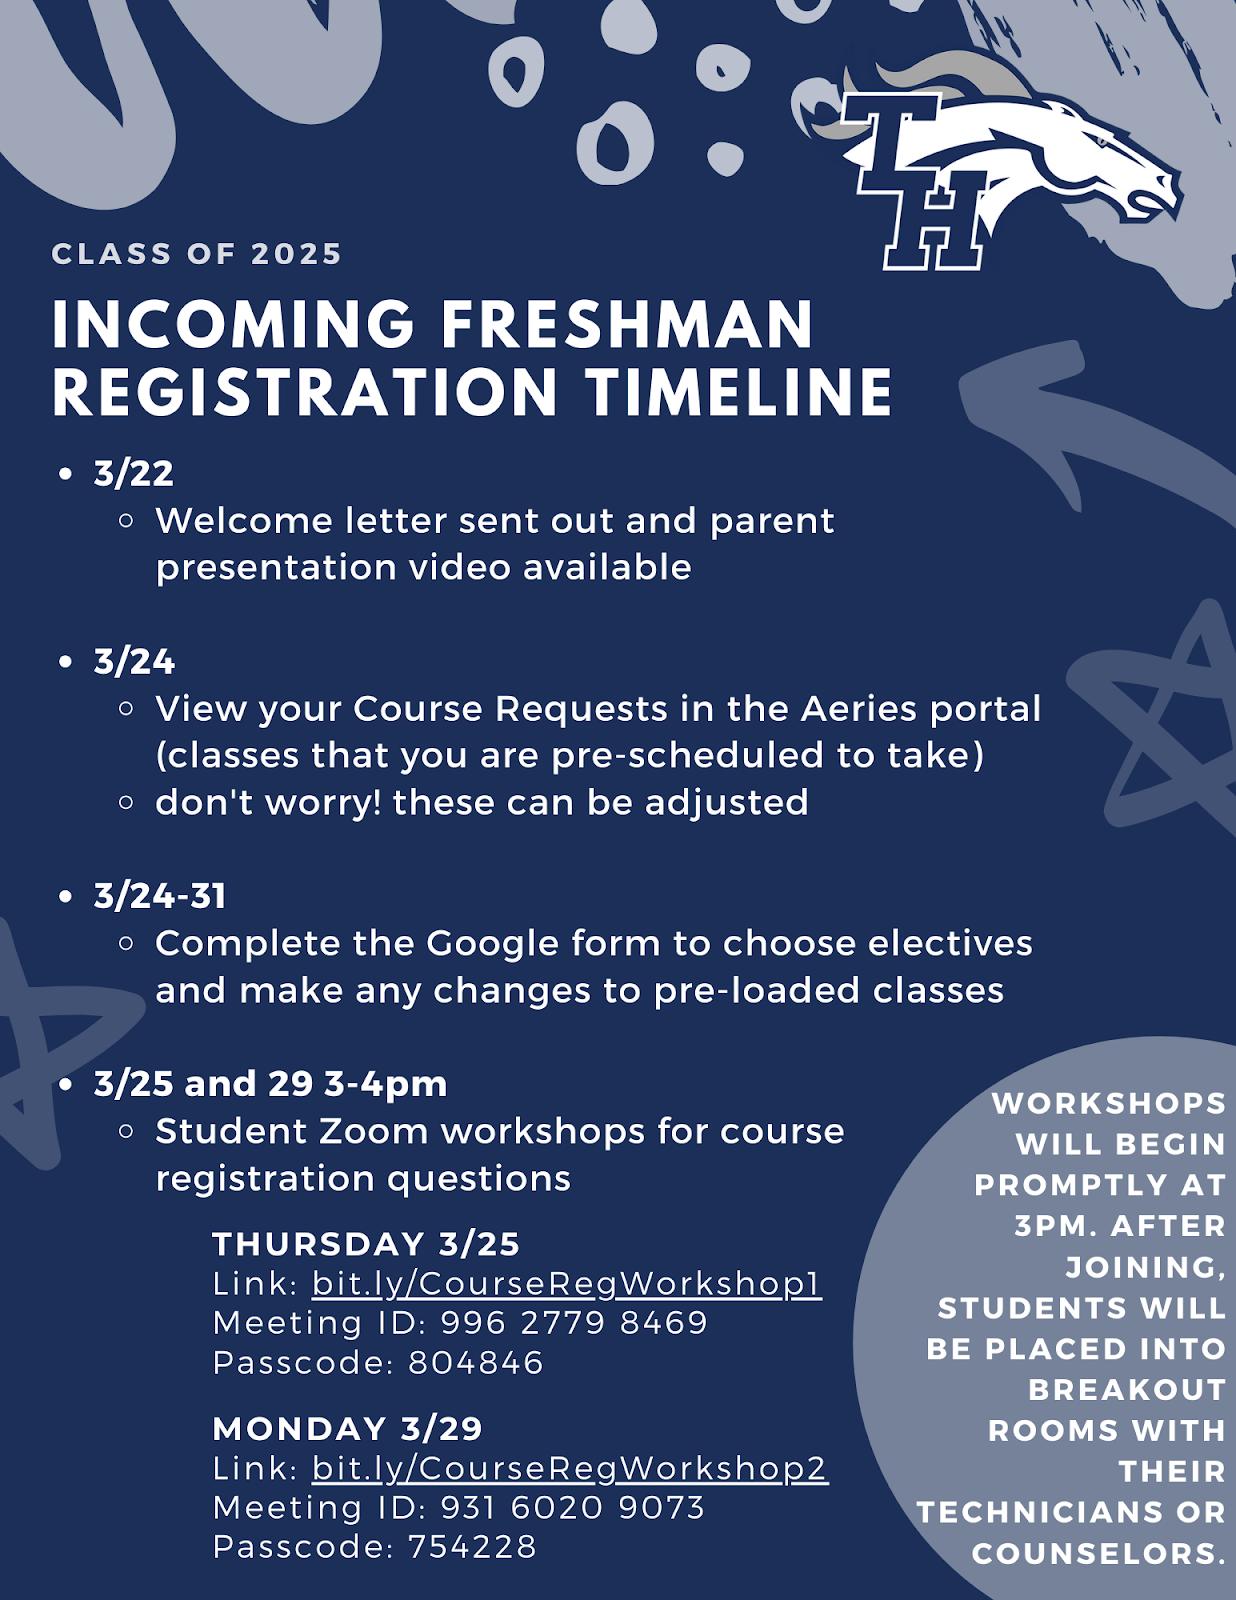 incoming freshman registration timeline